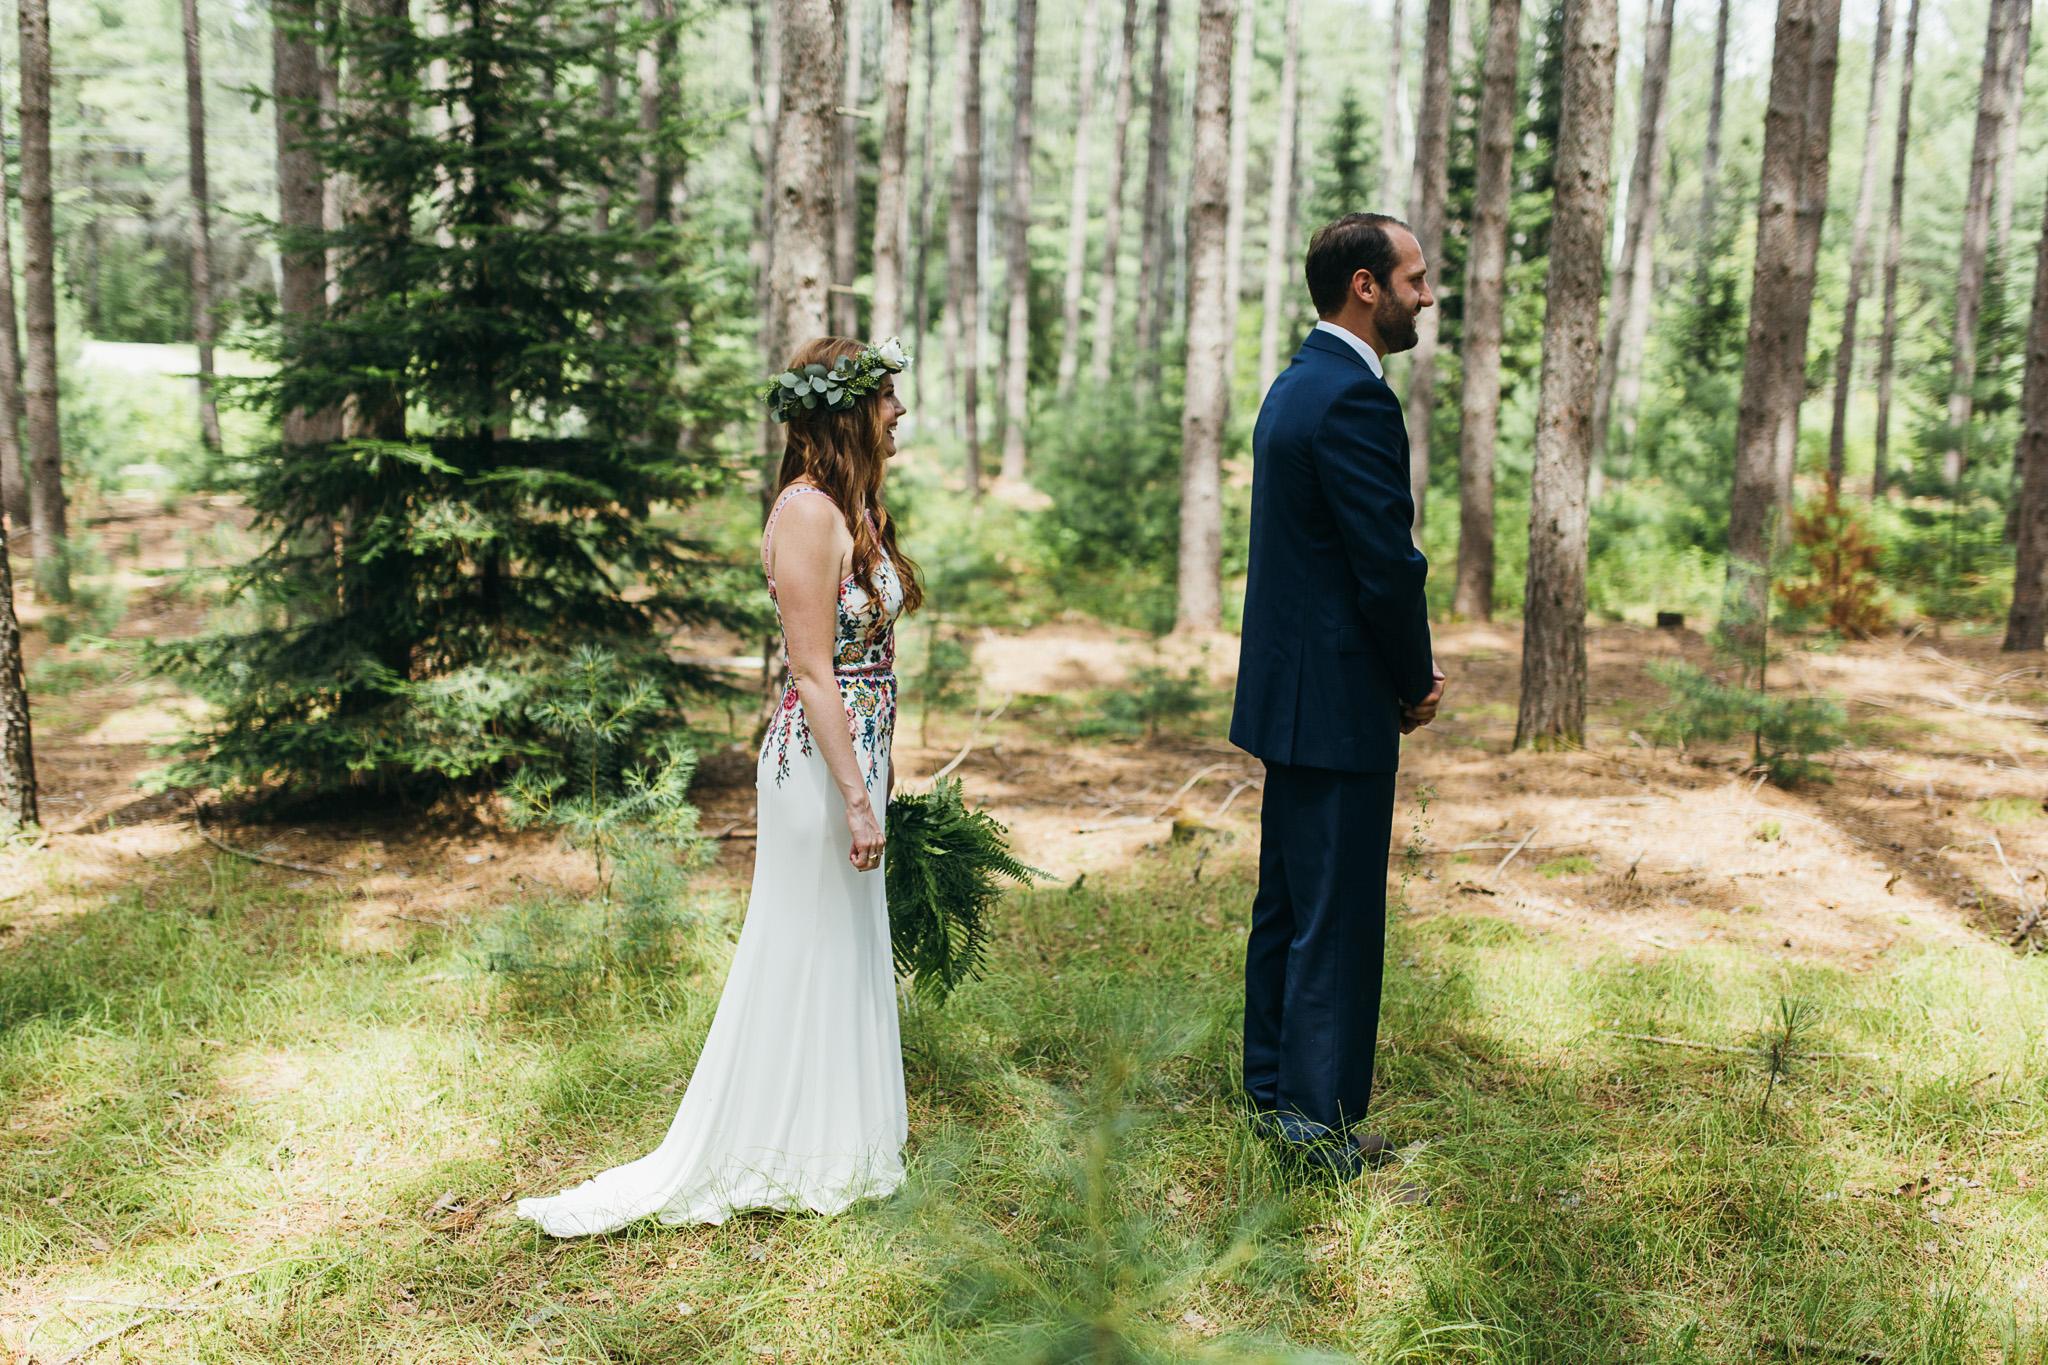 Intimate Backyard Wedding in Bancroft (14 of 143).jpg